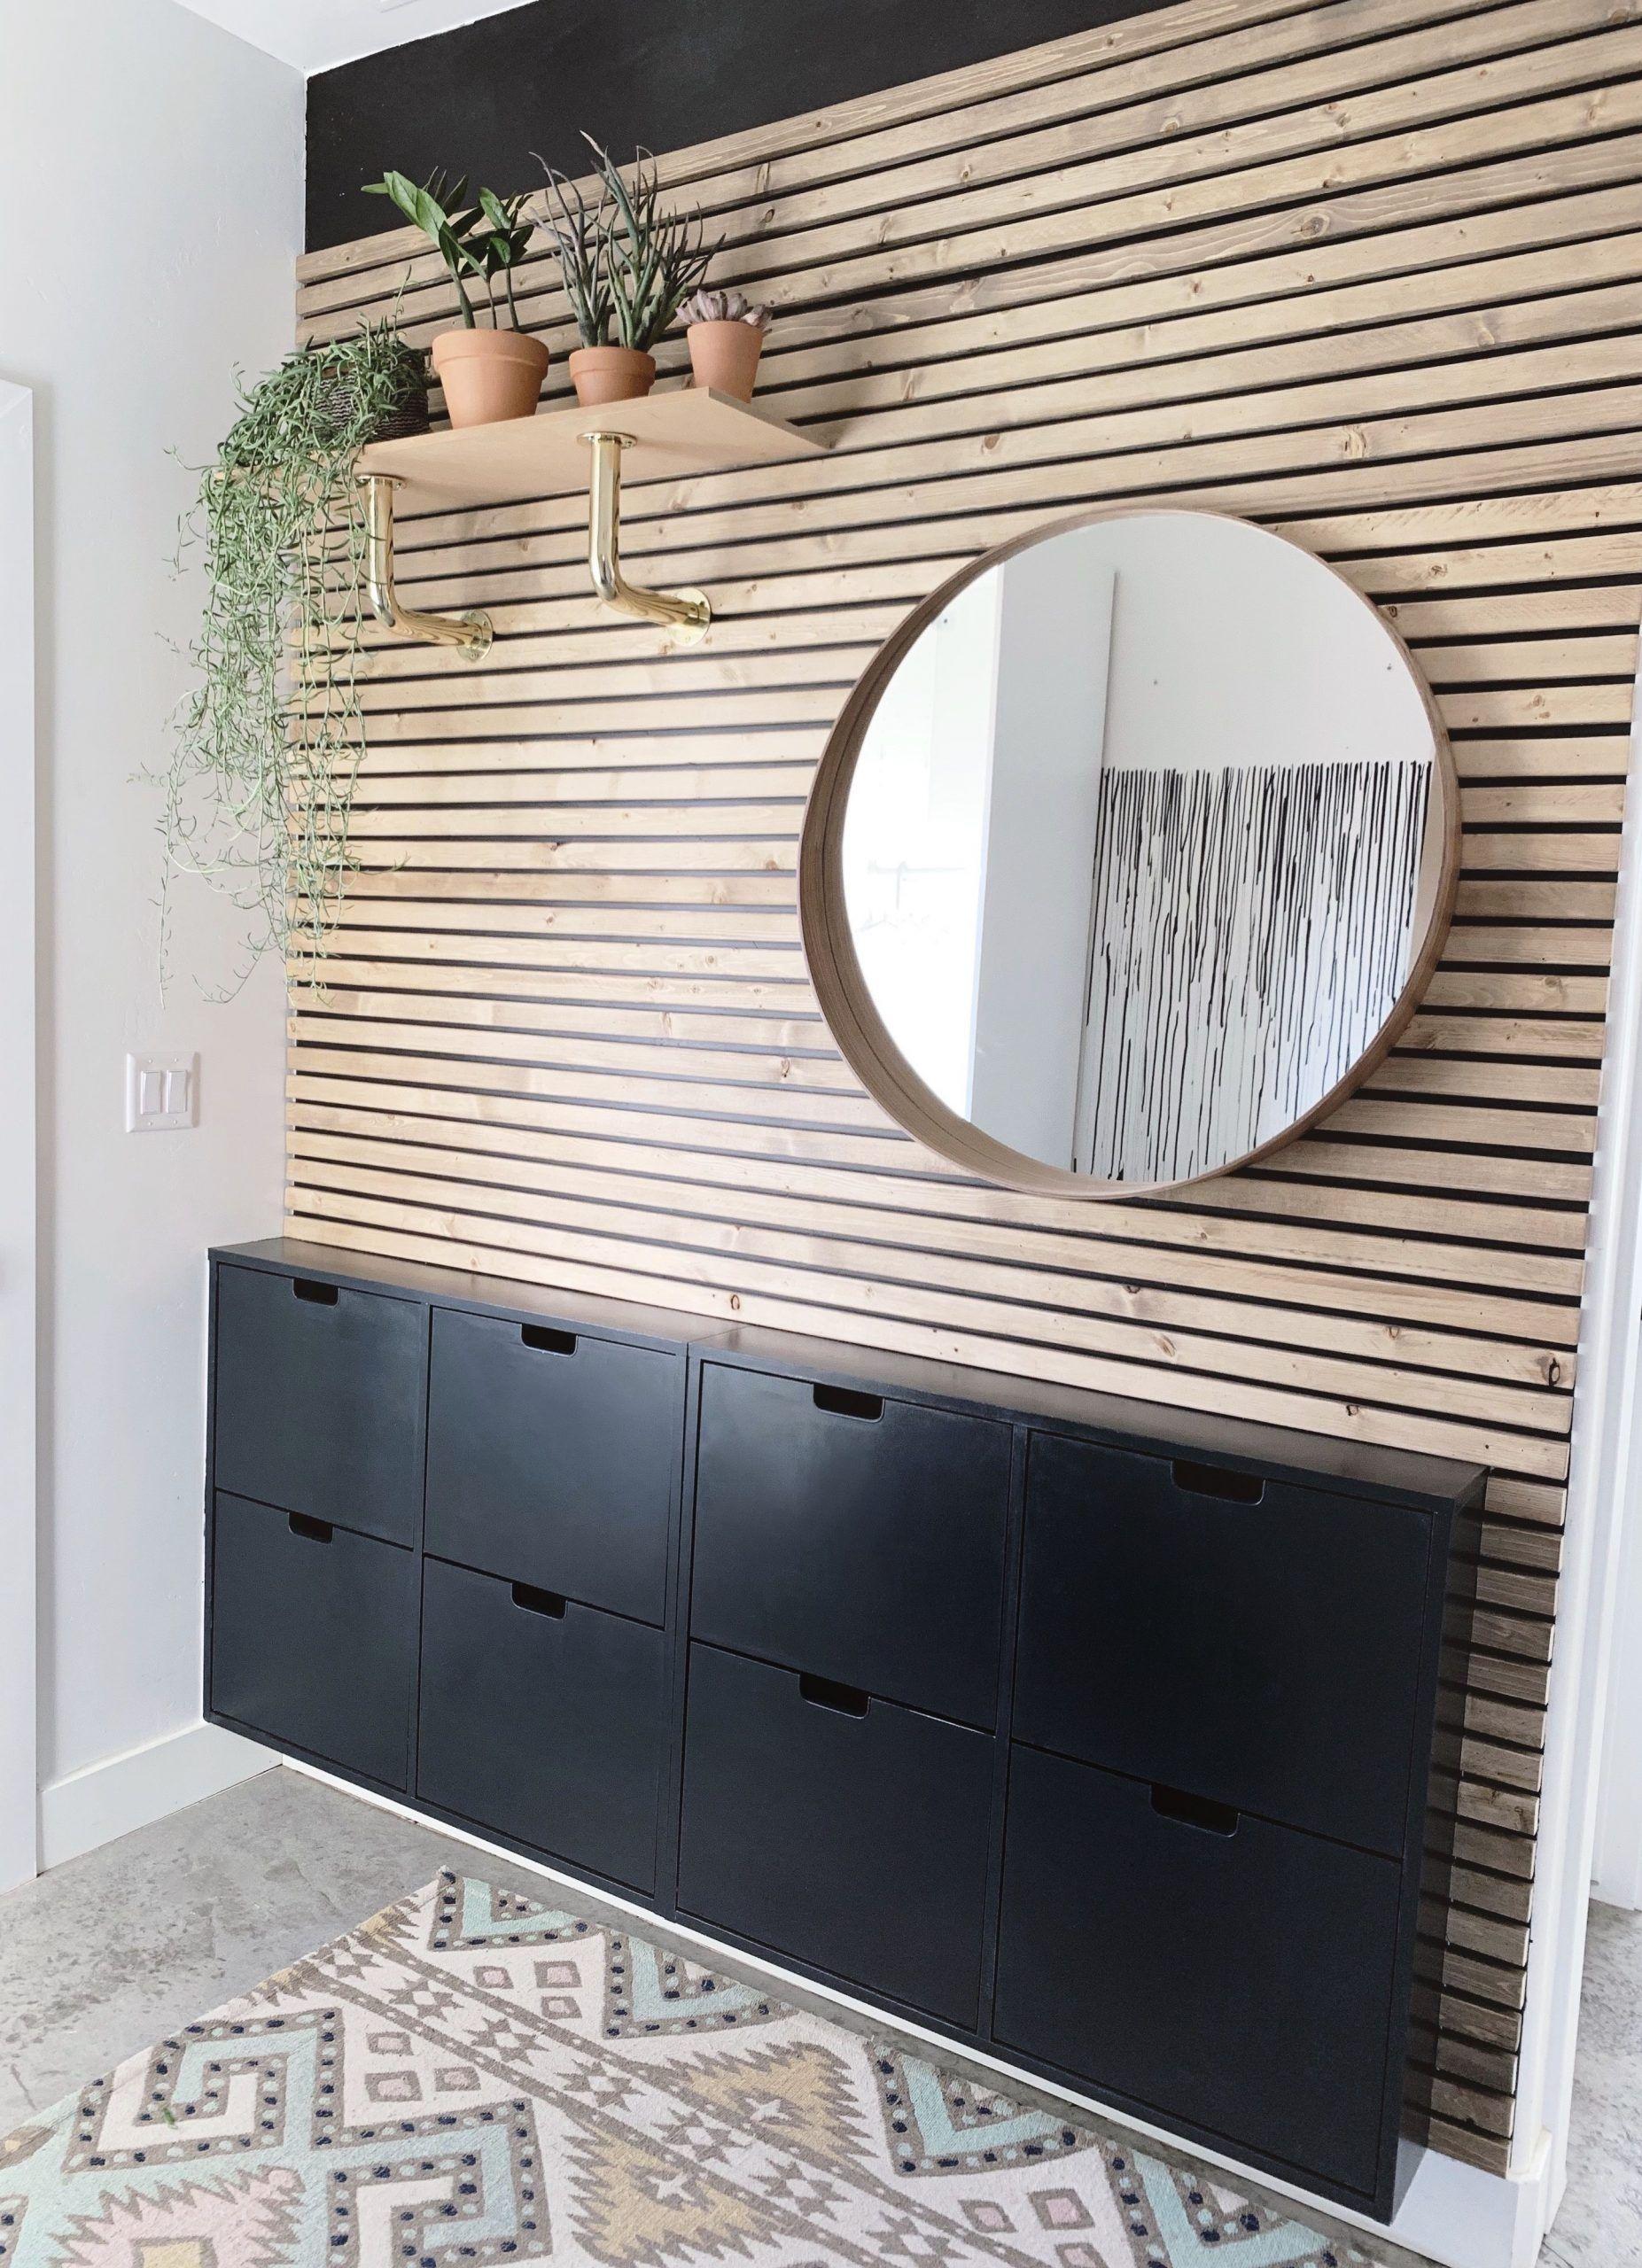 Wood Slat Wall Slat Wall Wood In 2020 Slat Wall Wood Slat Wall Wood Accent Wall